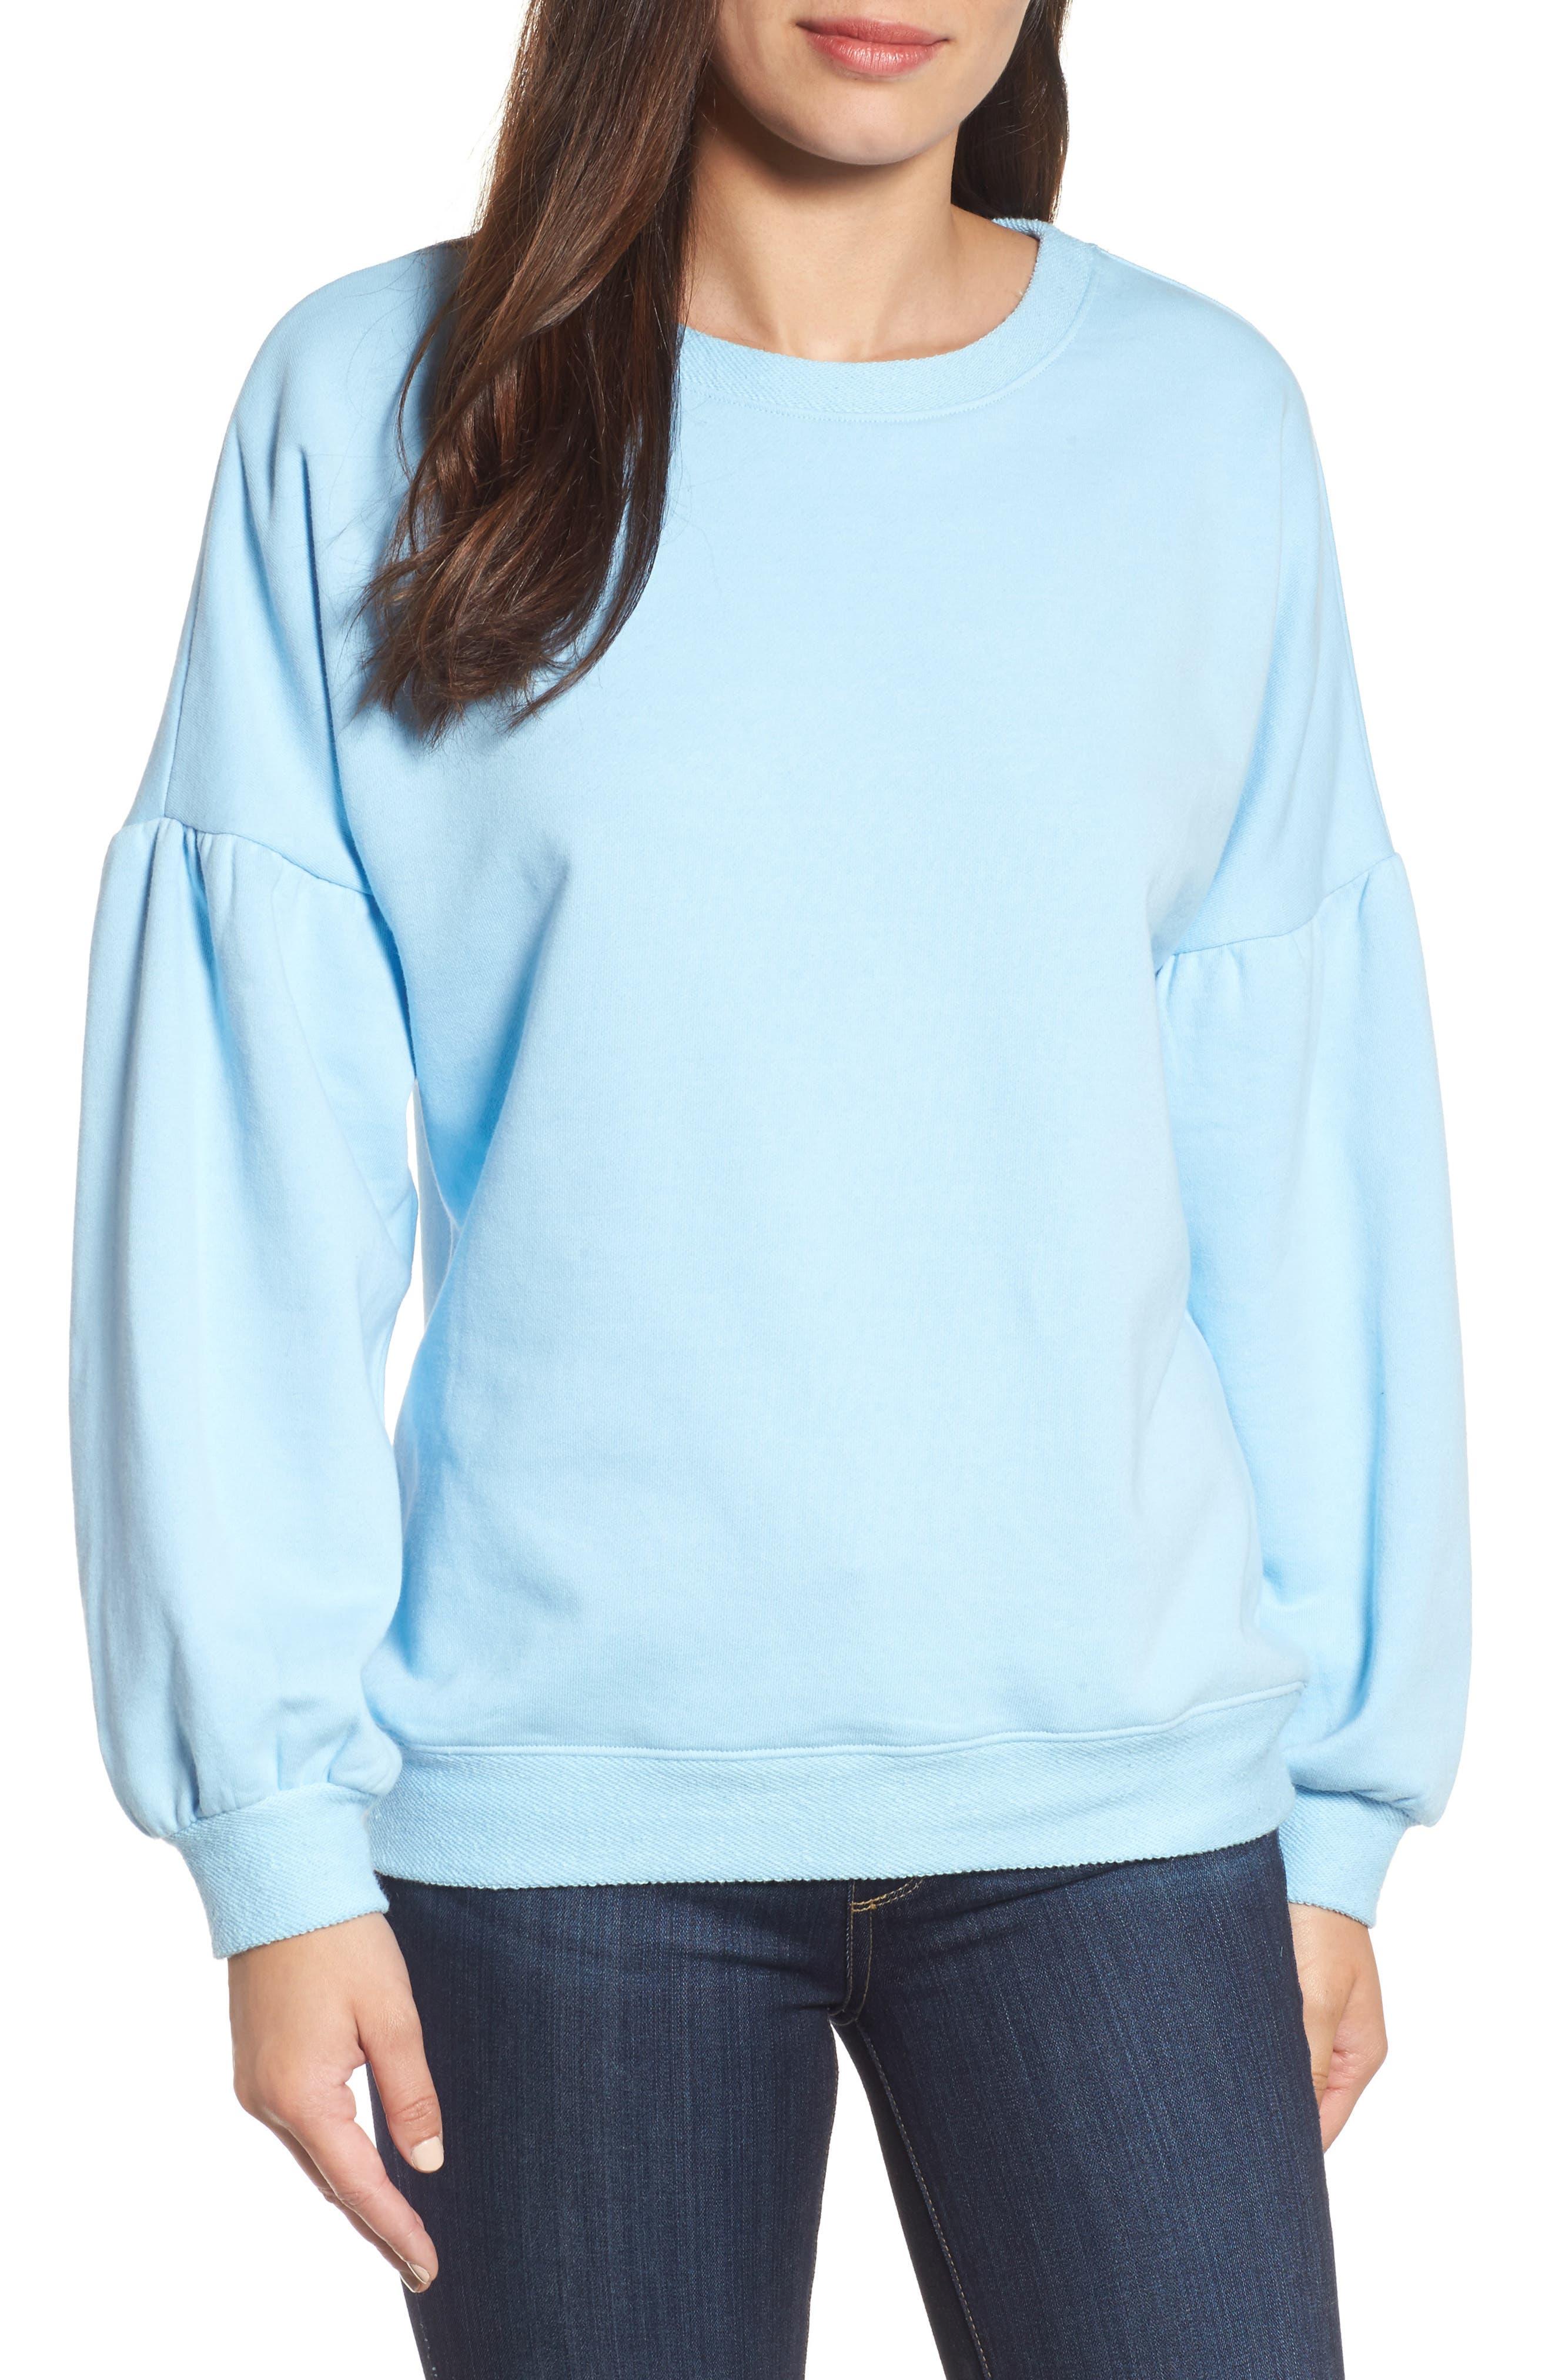 Allesia Sweatshirt,                         Main,                         color, 425